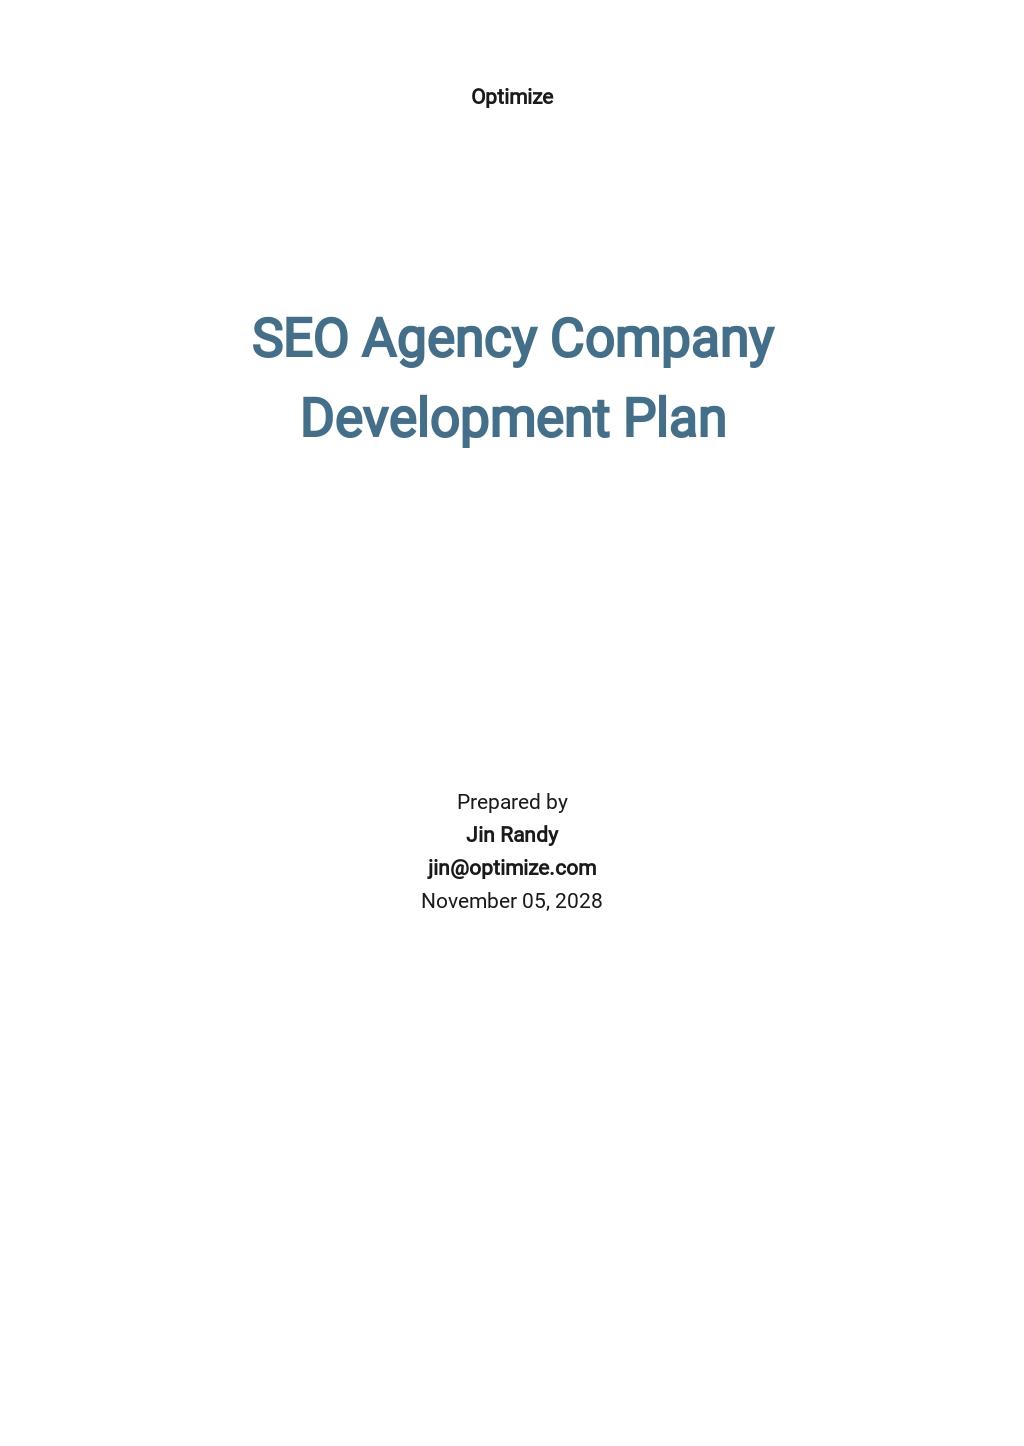 SEO Agency_Company Development Plan Template